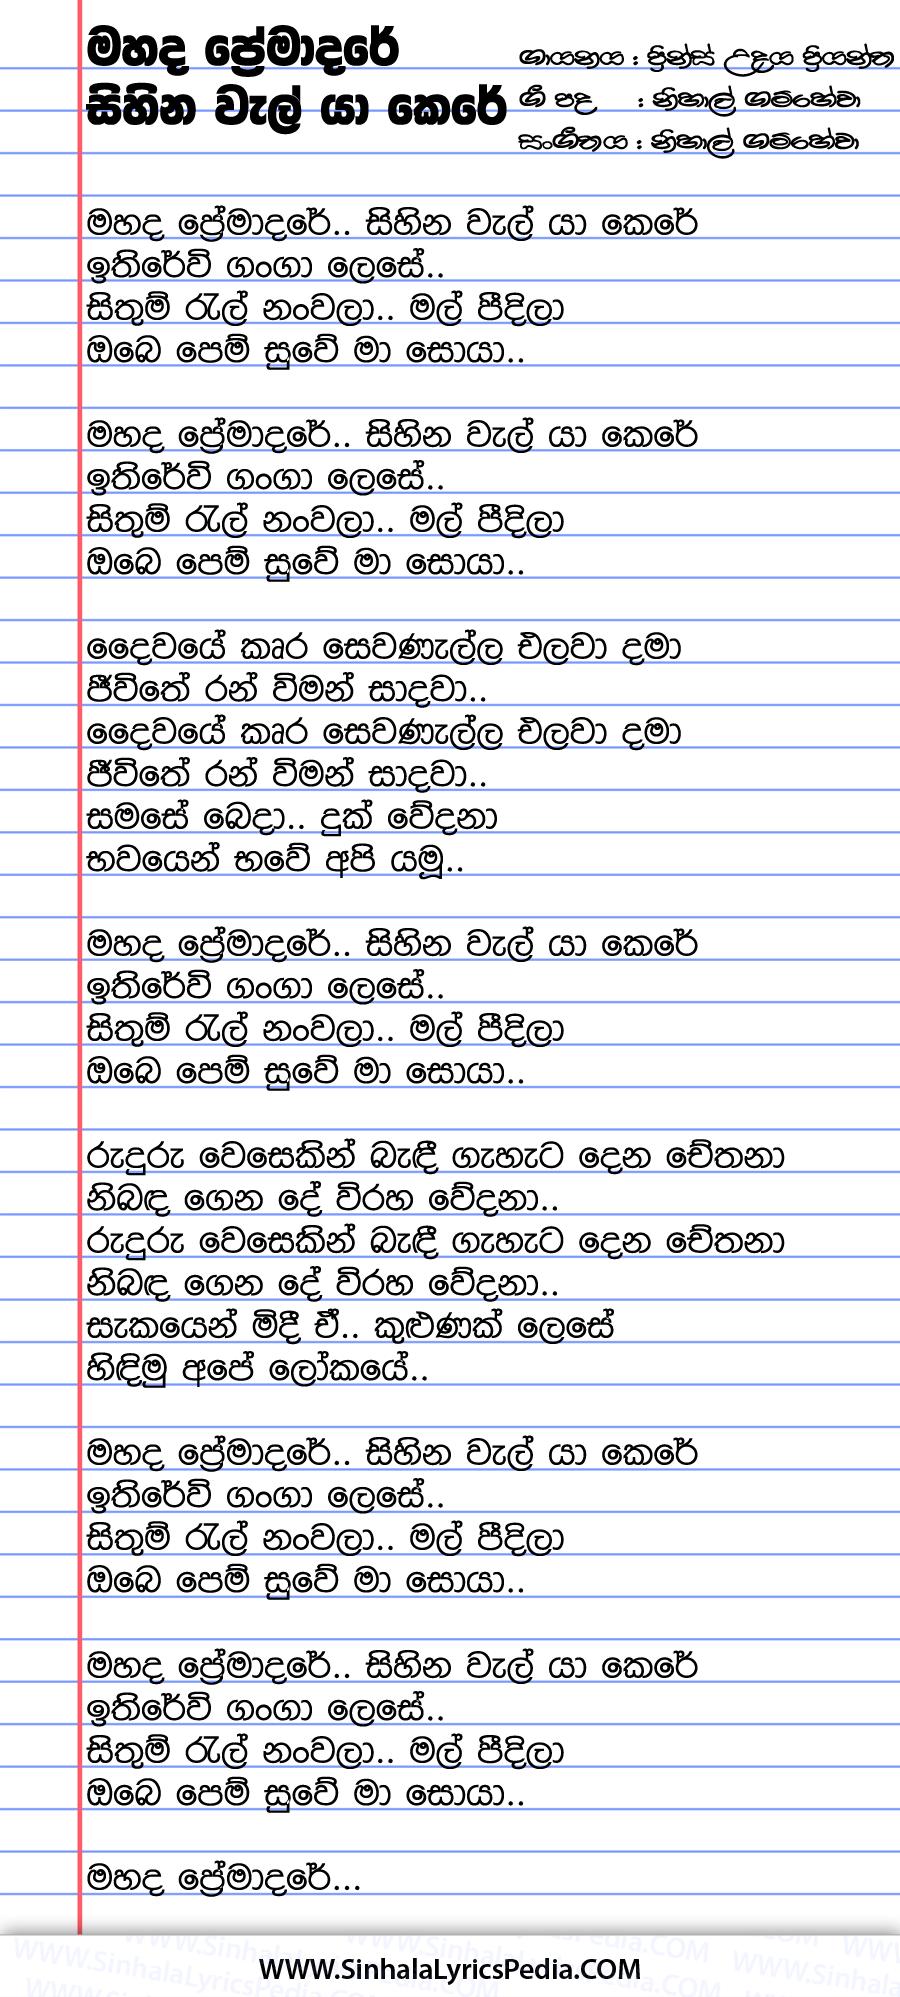 Mahada Premadare Sihina Wel Ya Kere Song Lyrics